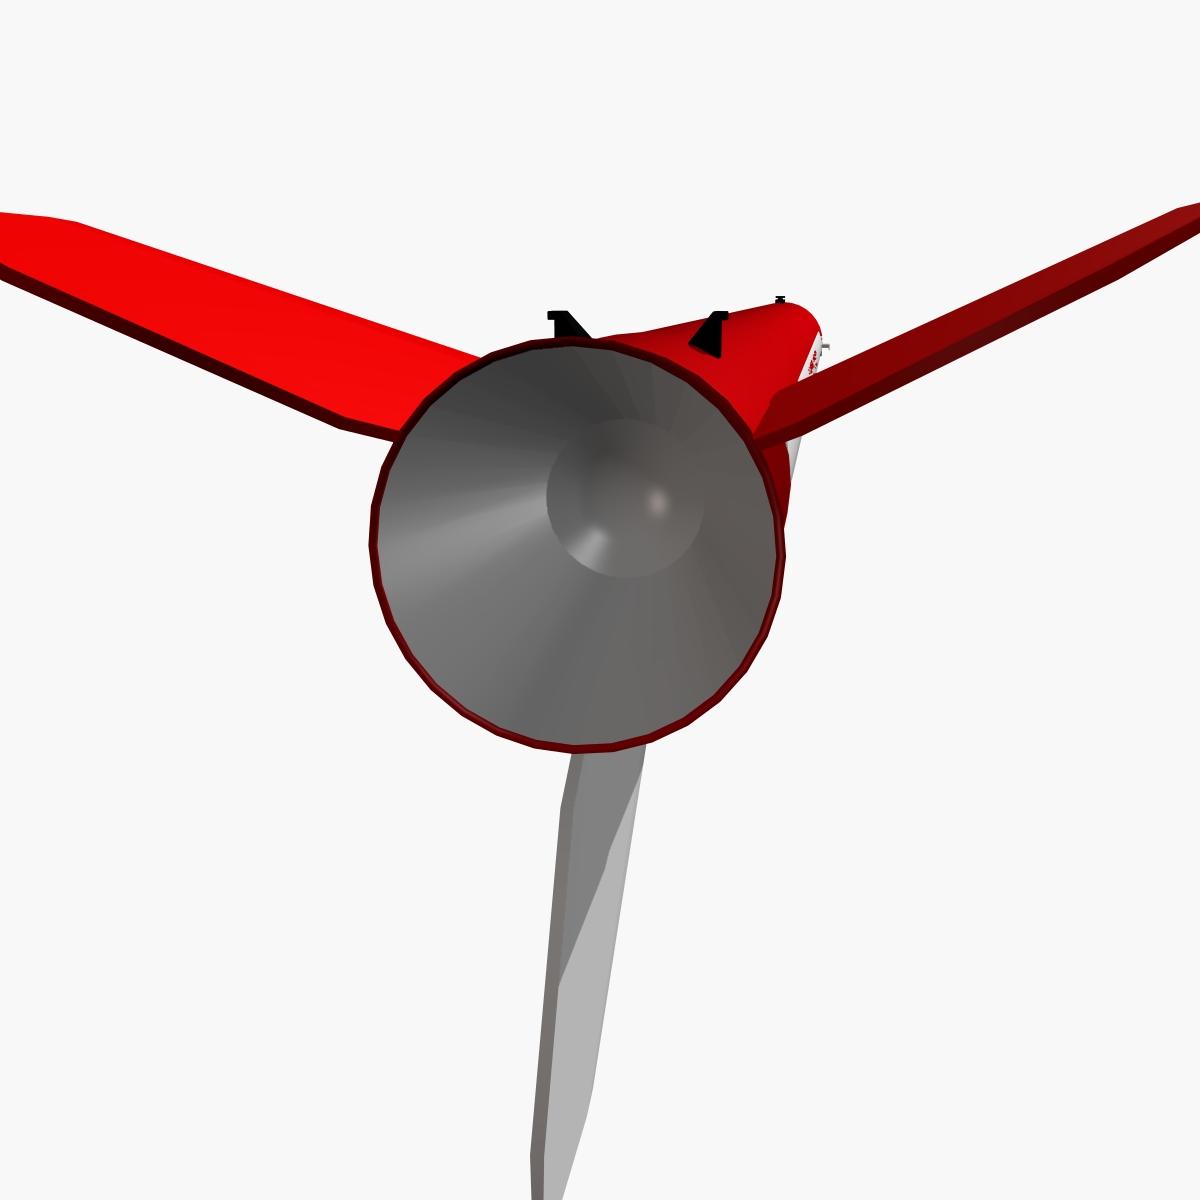 хар хун III пуужин 3d загвар 3ds дууг сонсогдож dxf cob x obj 150819